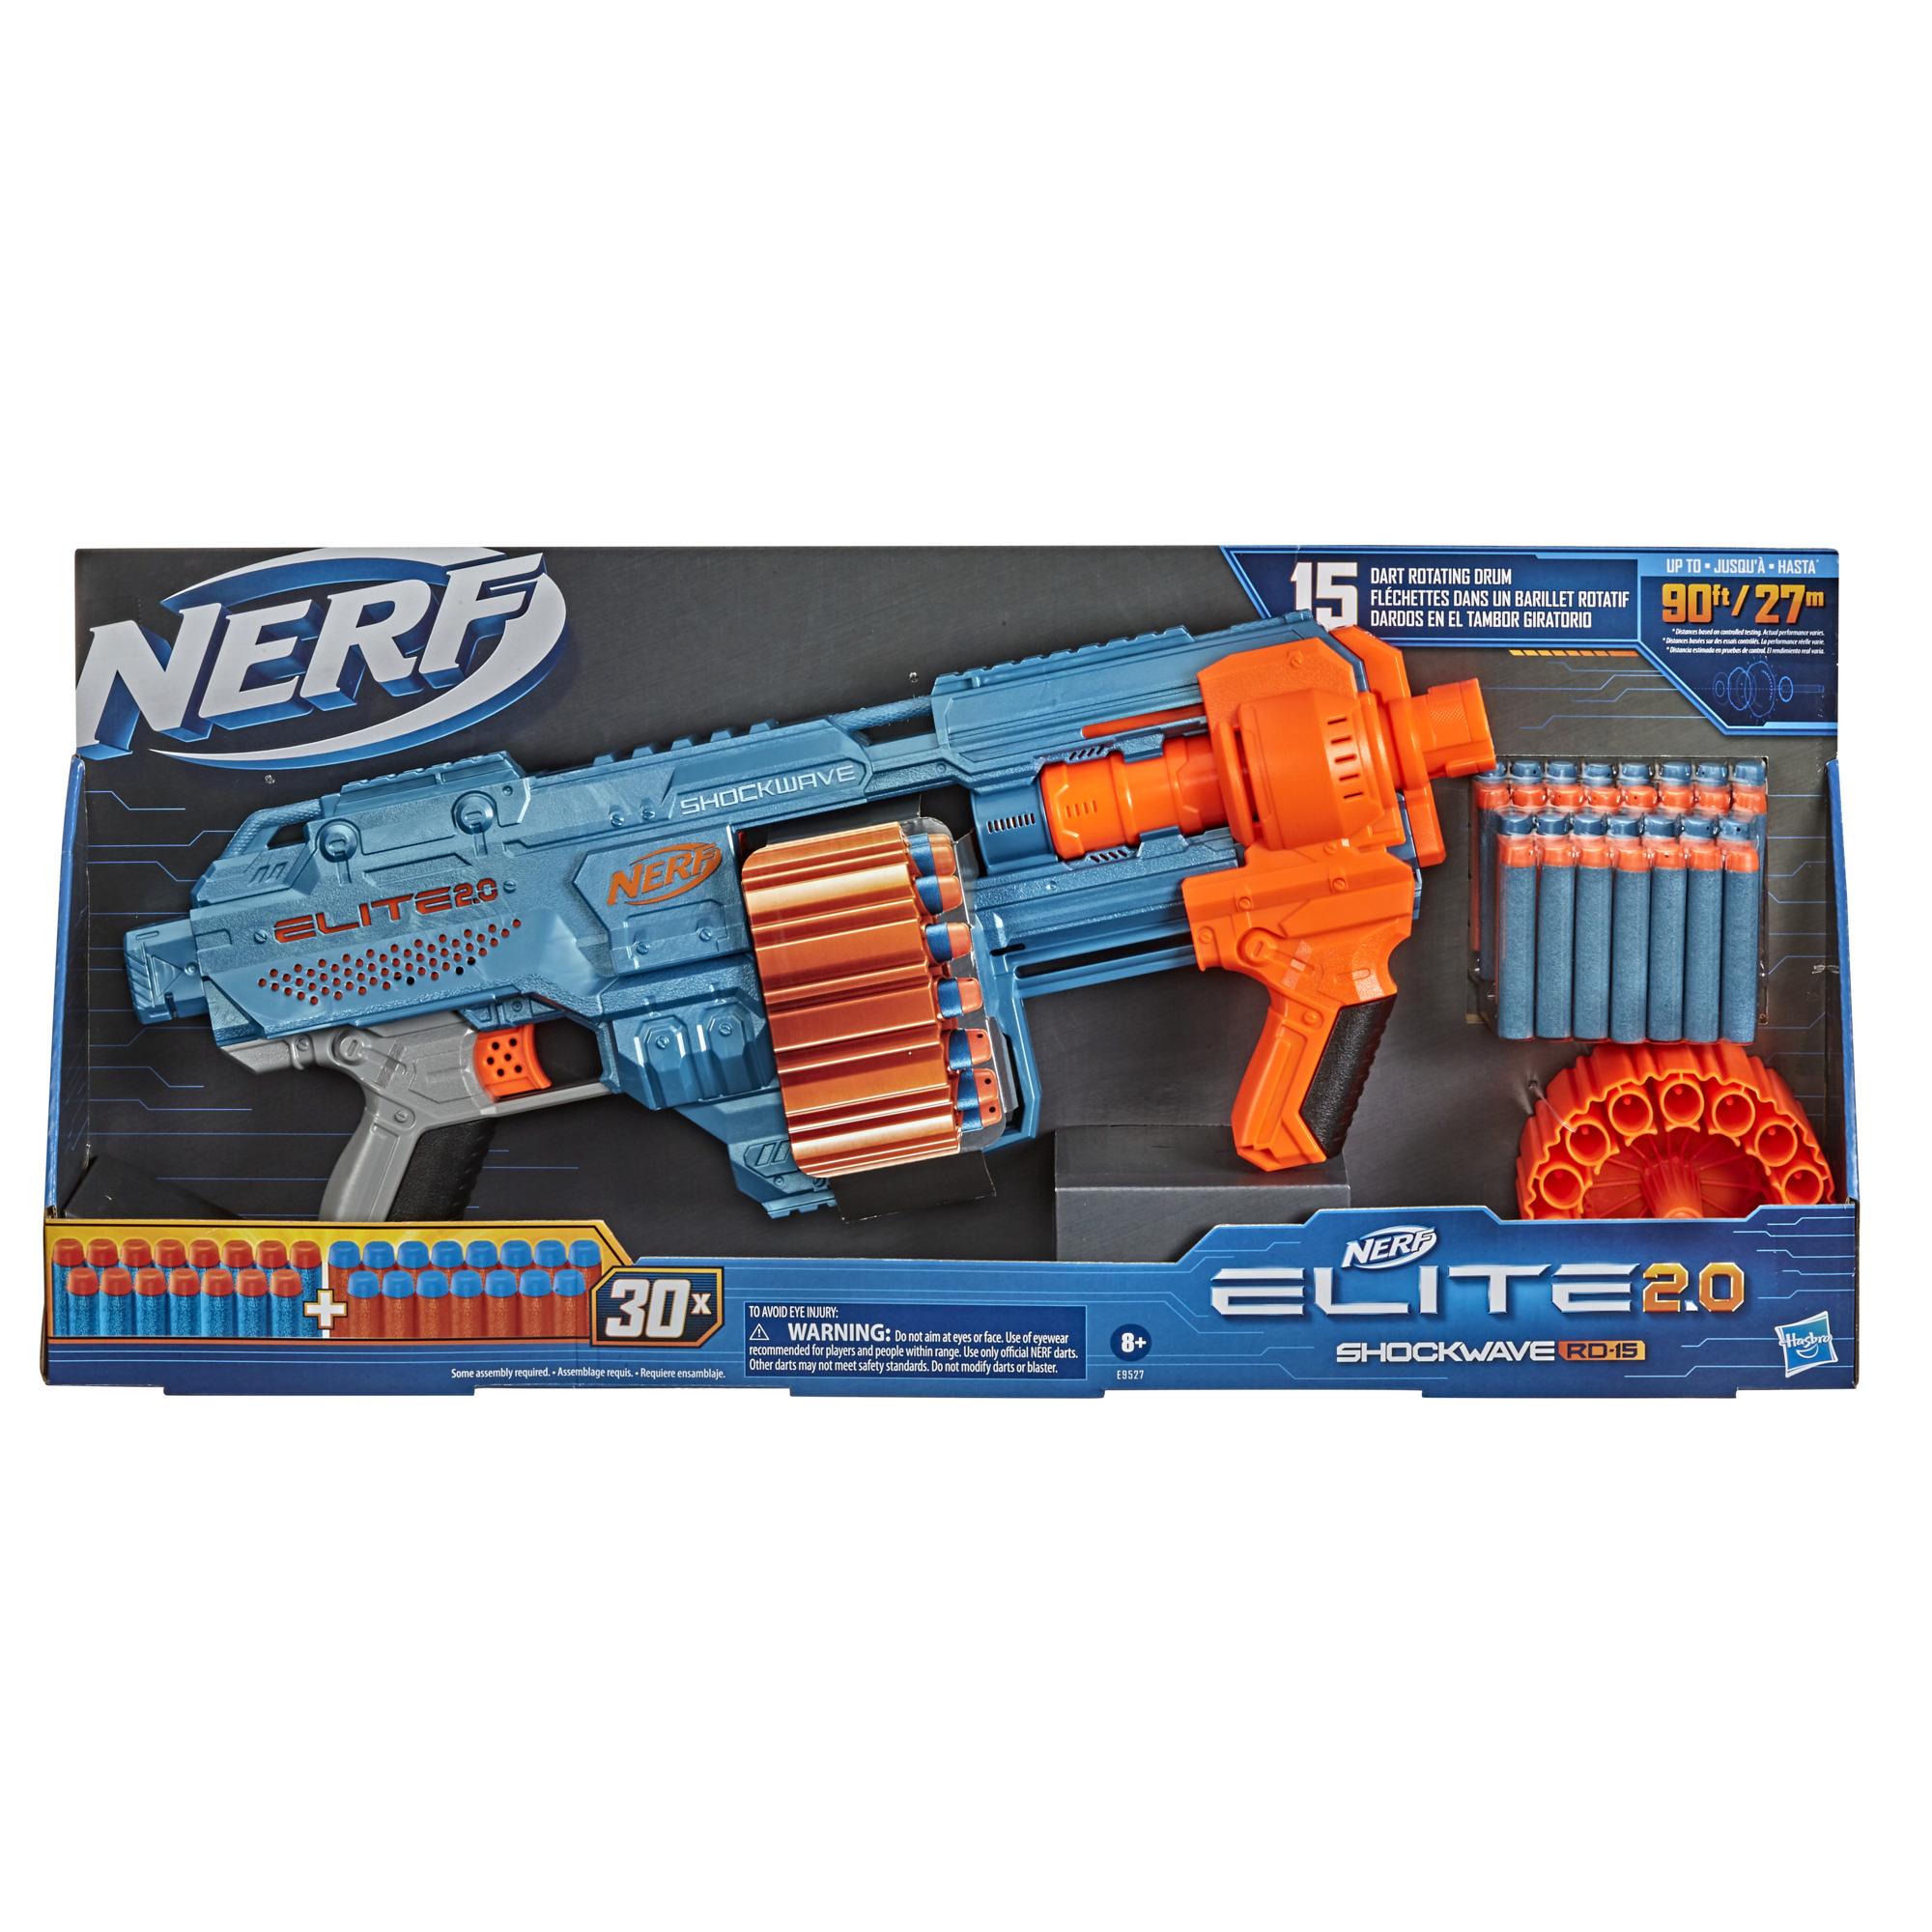 Nerf Elite 2.0 Shockwave RD-15 Εκτοξευτής, 30 βελάκια Nerf, Περιστρεφόμενος μύλος για 15 βελάκια, Καταιγισμός πυρός, Ενσωματωμένες δυνατότητες εξατομίκευσης